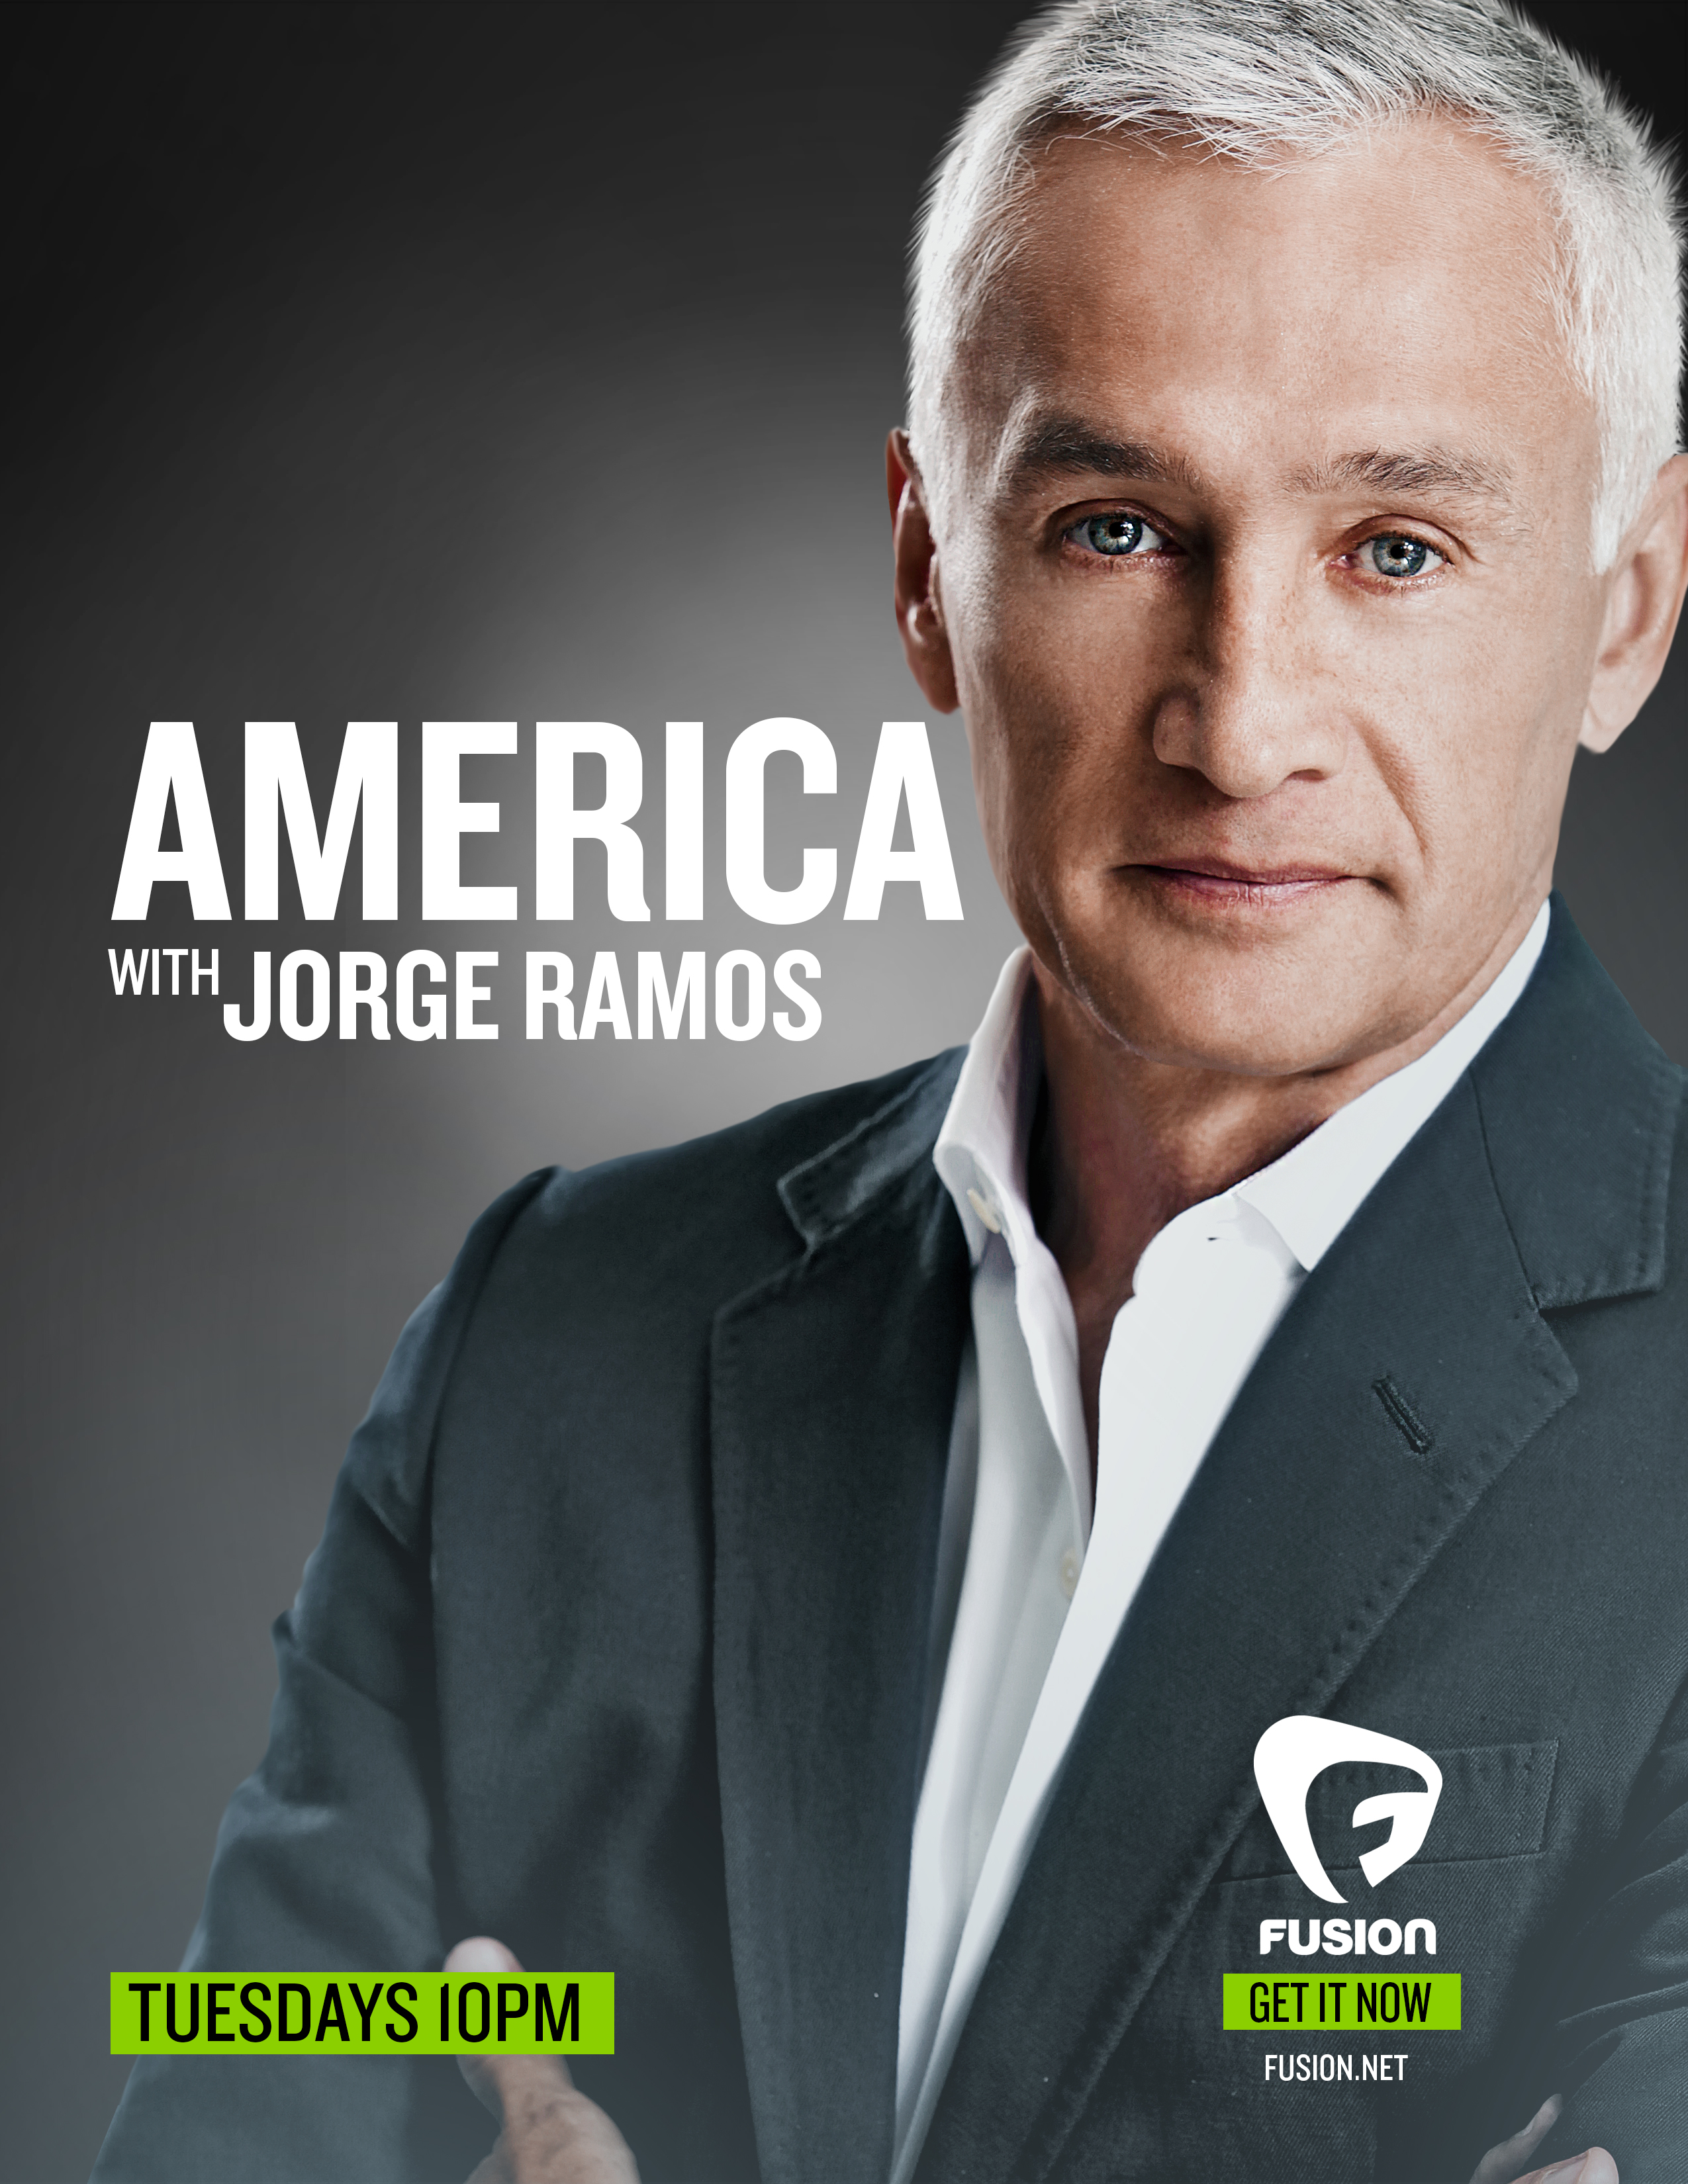 America with Jorge Ramos